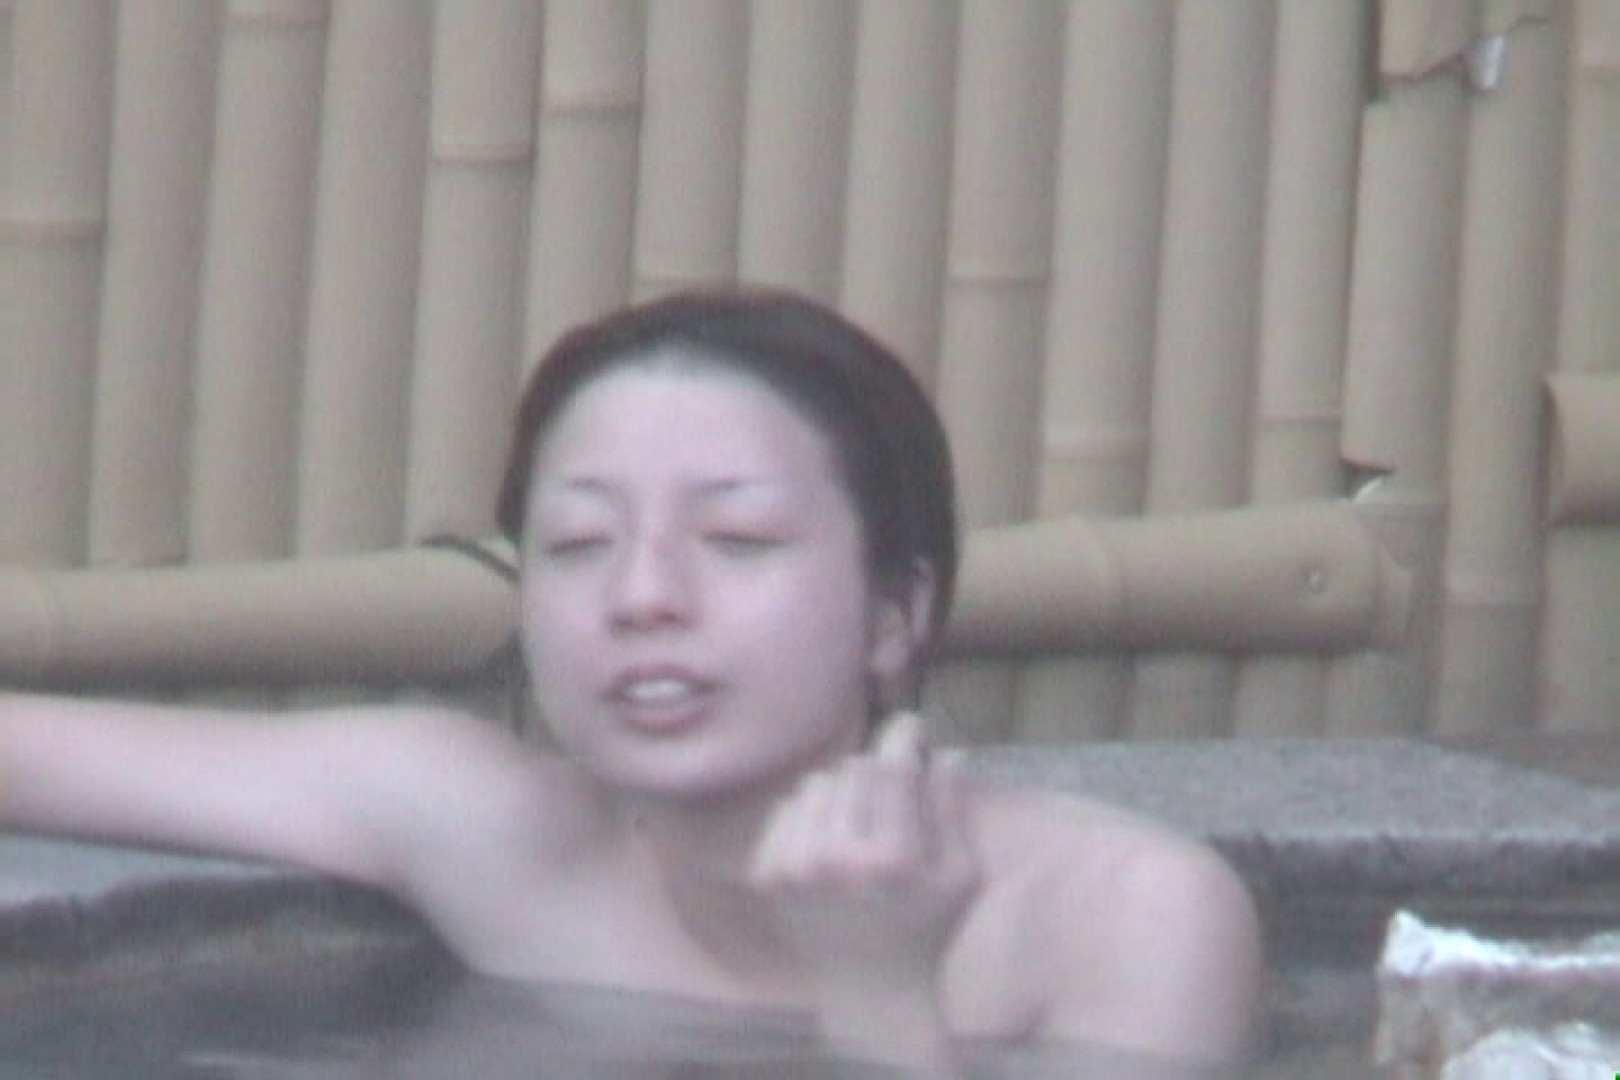 Aquaな露天風呂Vol.608 HなOL | 盗撮  89pic 11